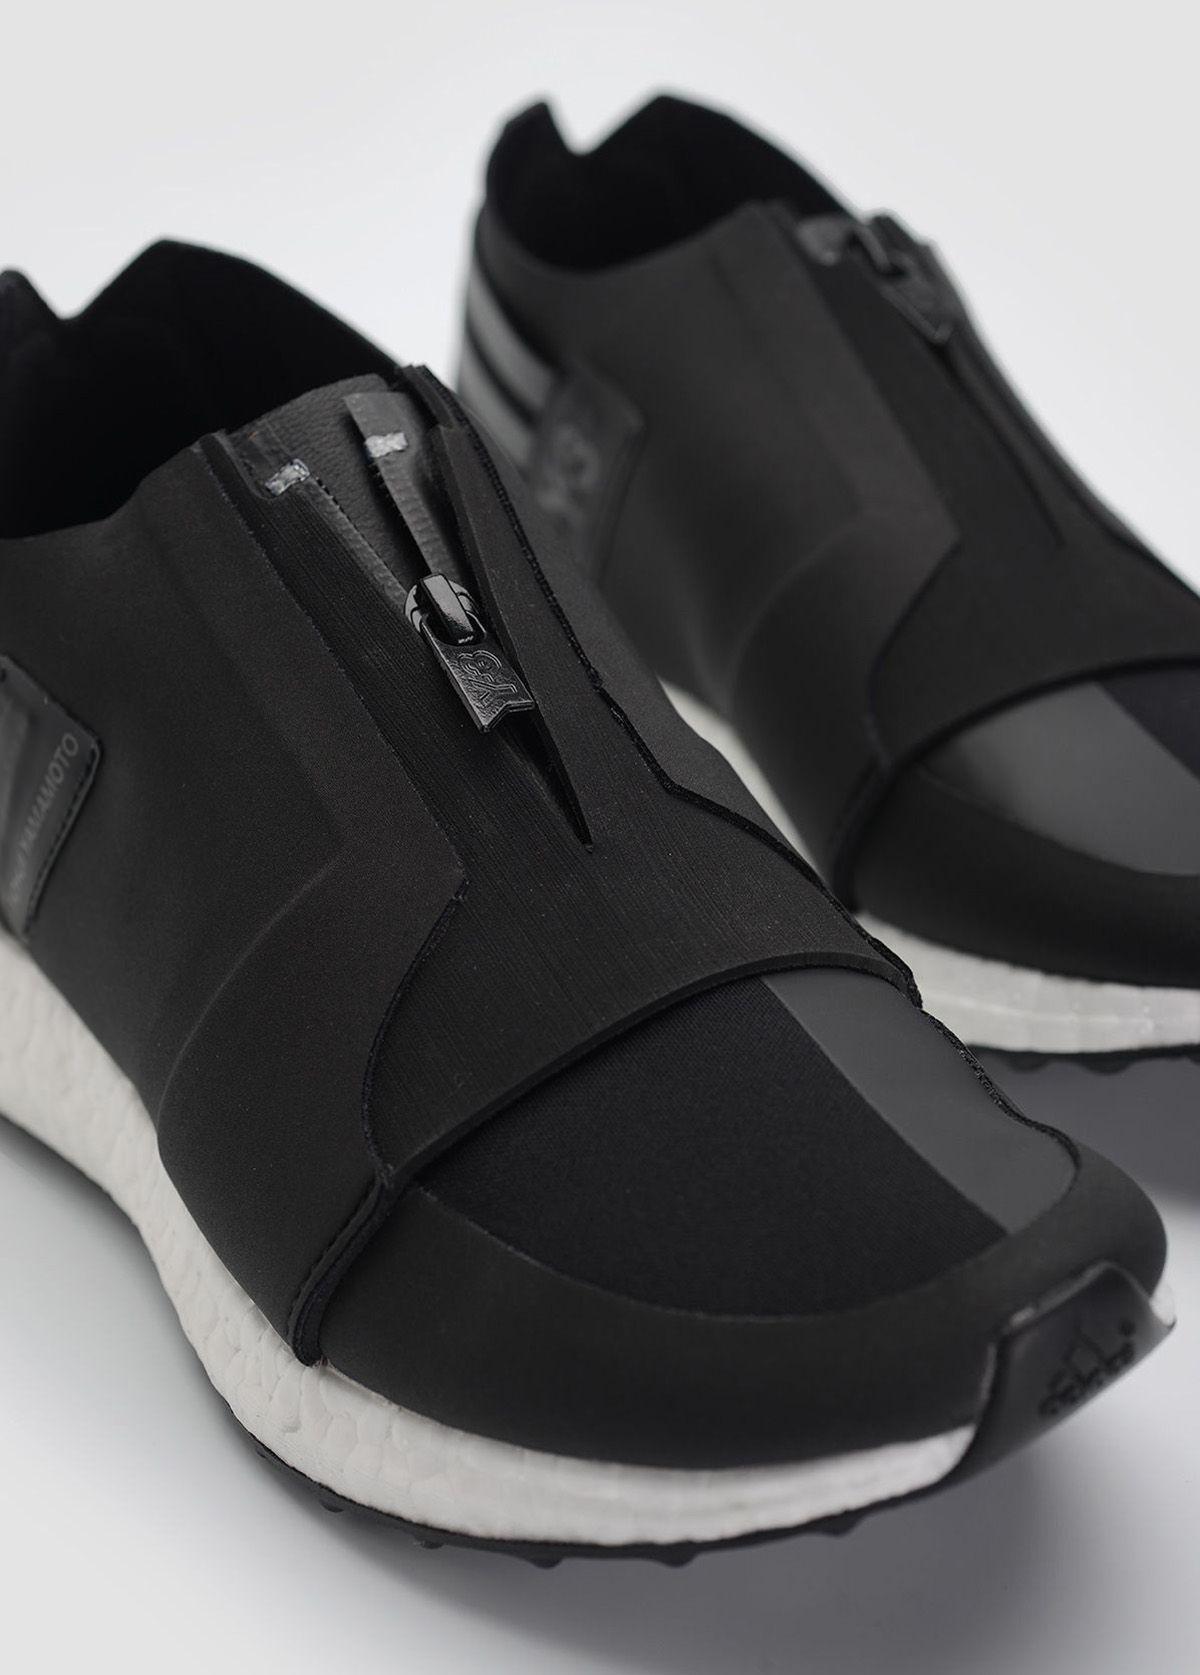 adidas Y,3 Xray Zip Low BOOST Black